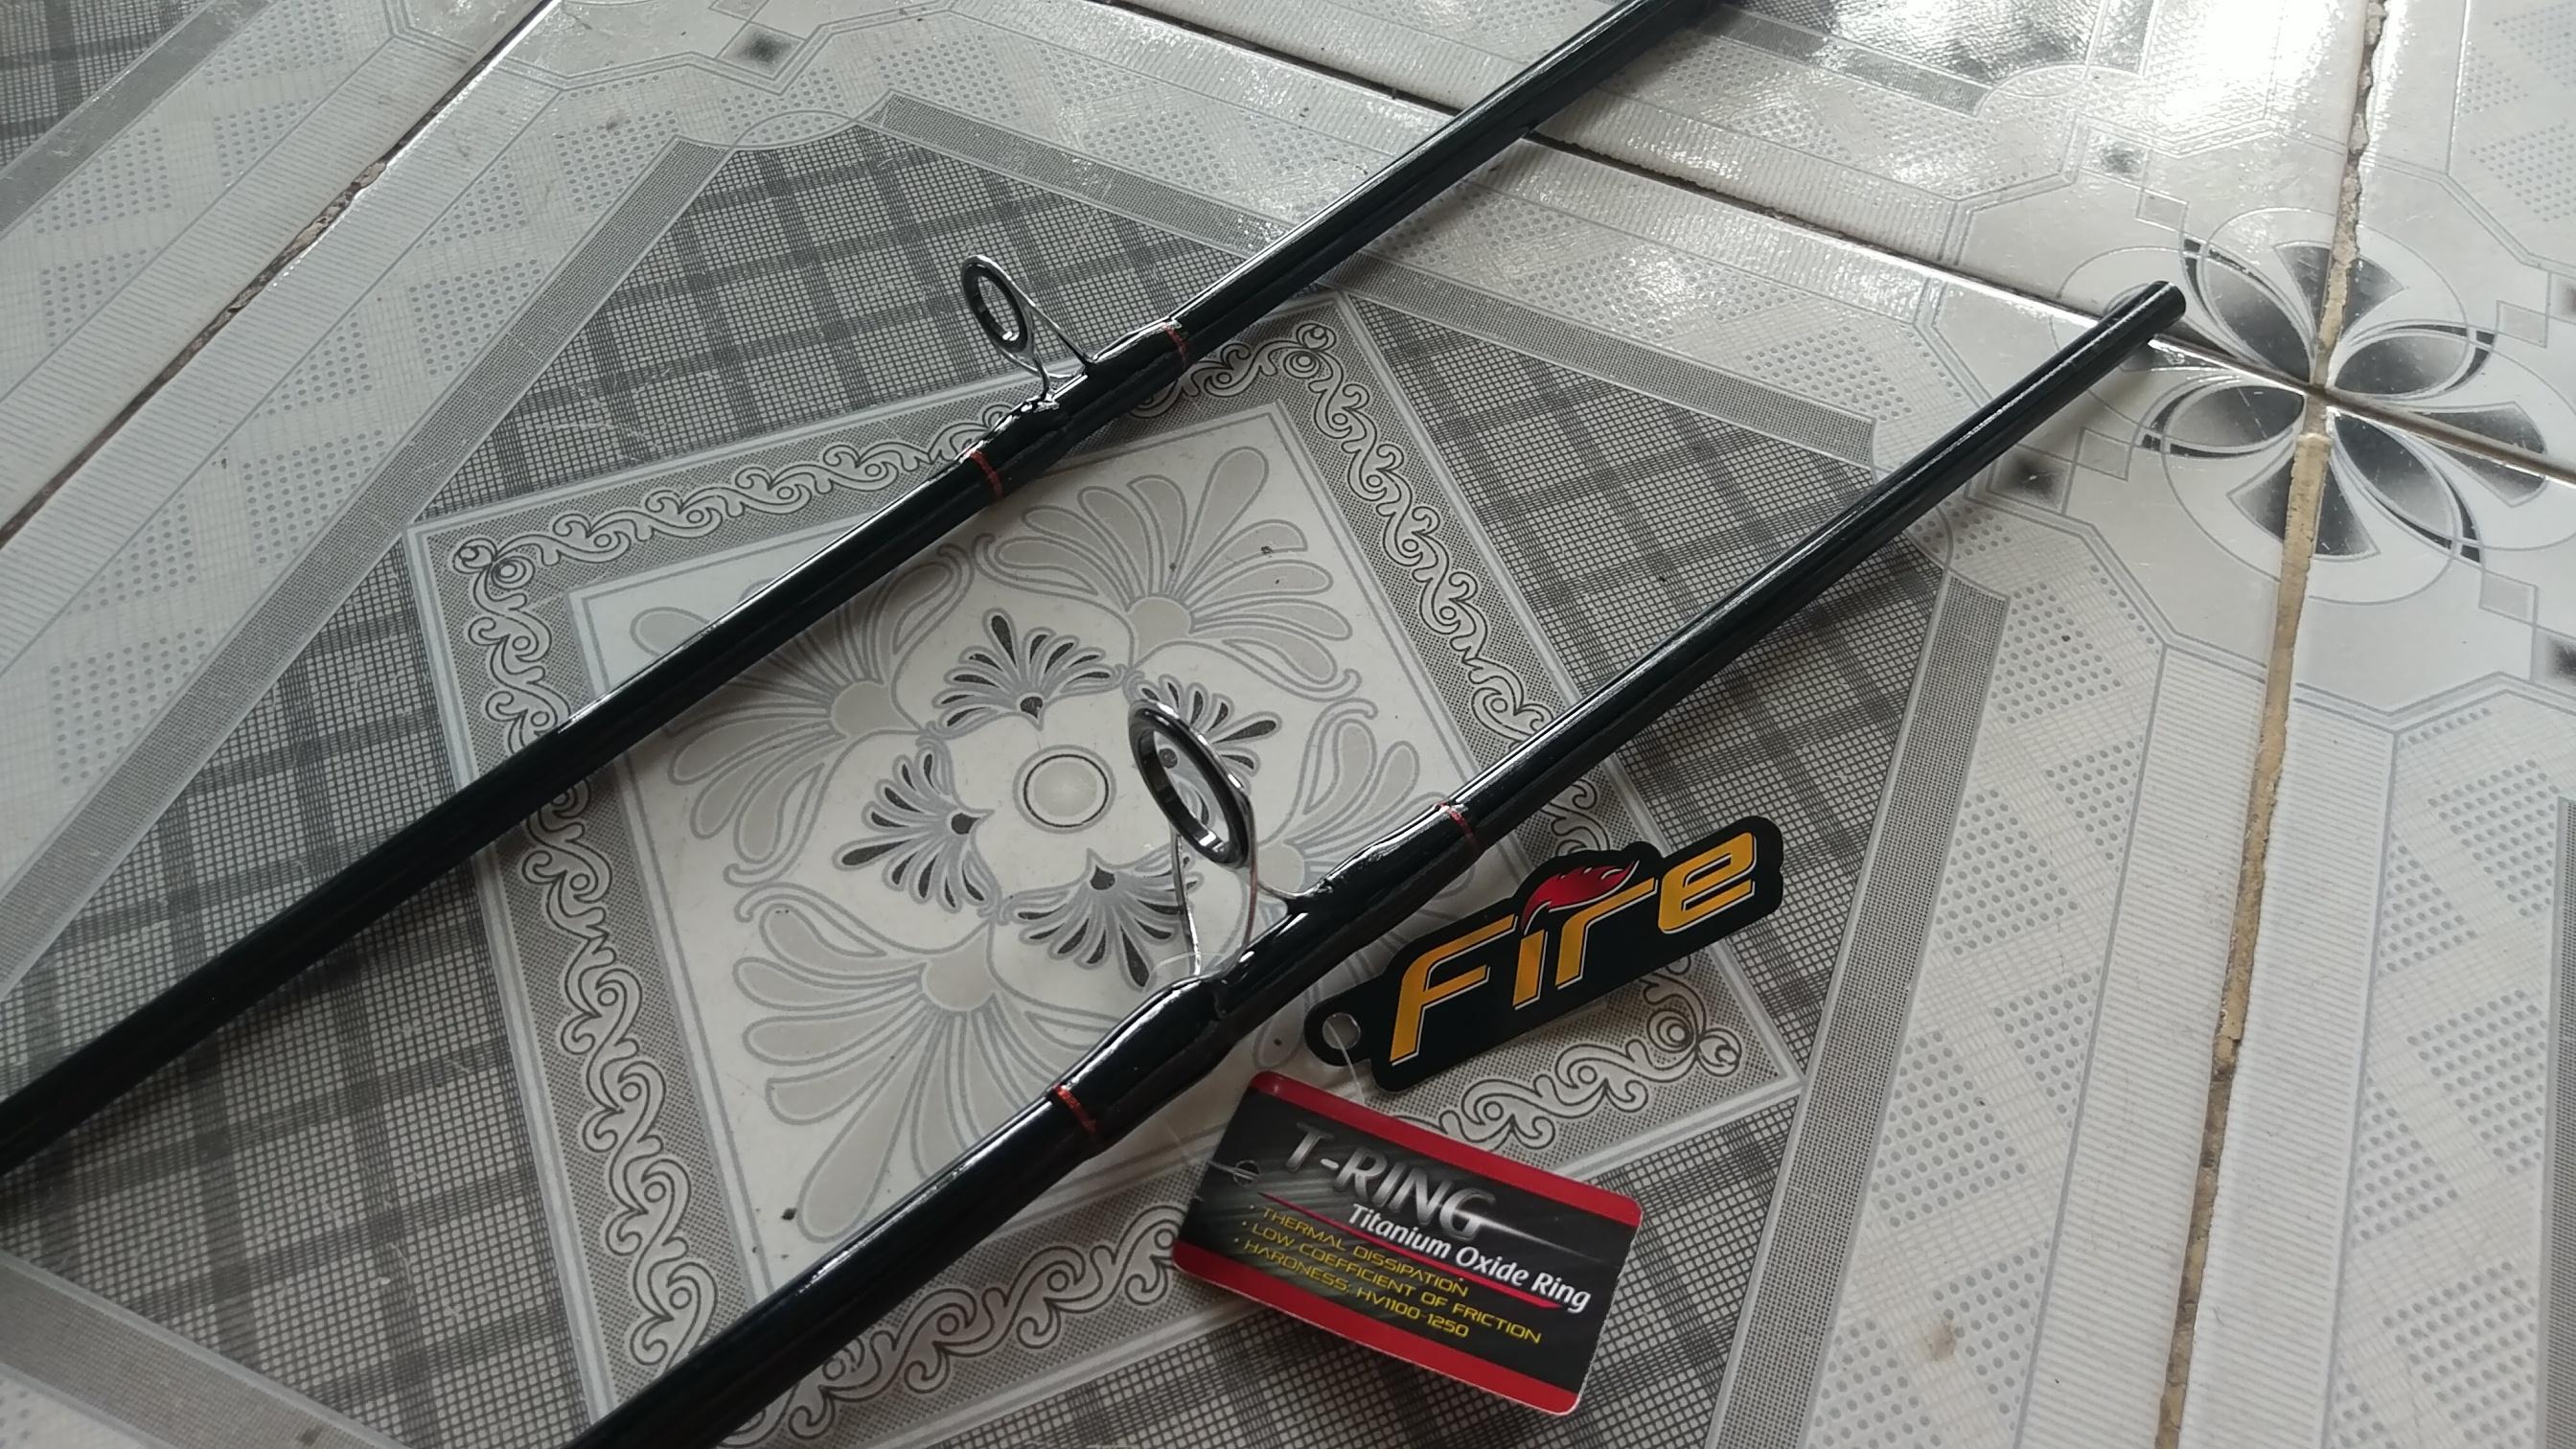 Cần câu bạo lực Pioneer Fire 2m4